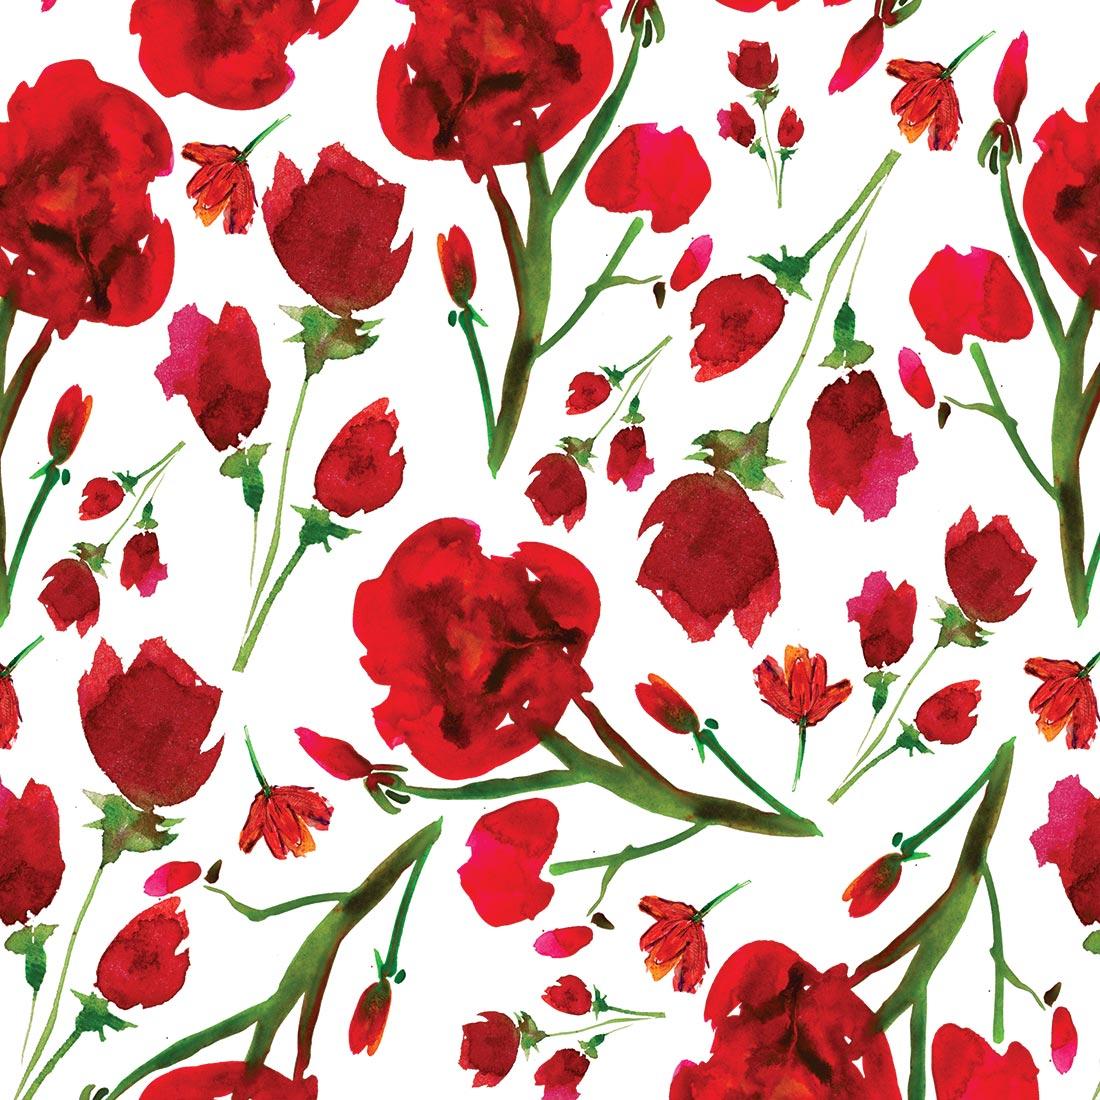 Cute Baby Wallpaper For Whatsapp Dp Papel De Parede Floral Estampado Rosa Ve Jmi Decor Elo7